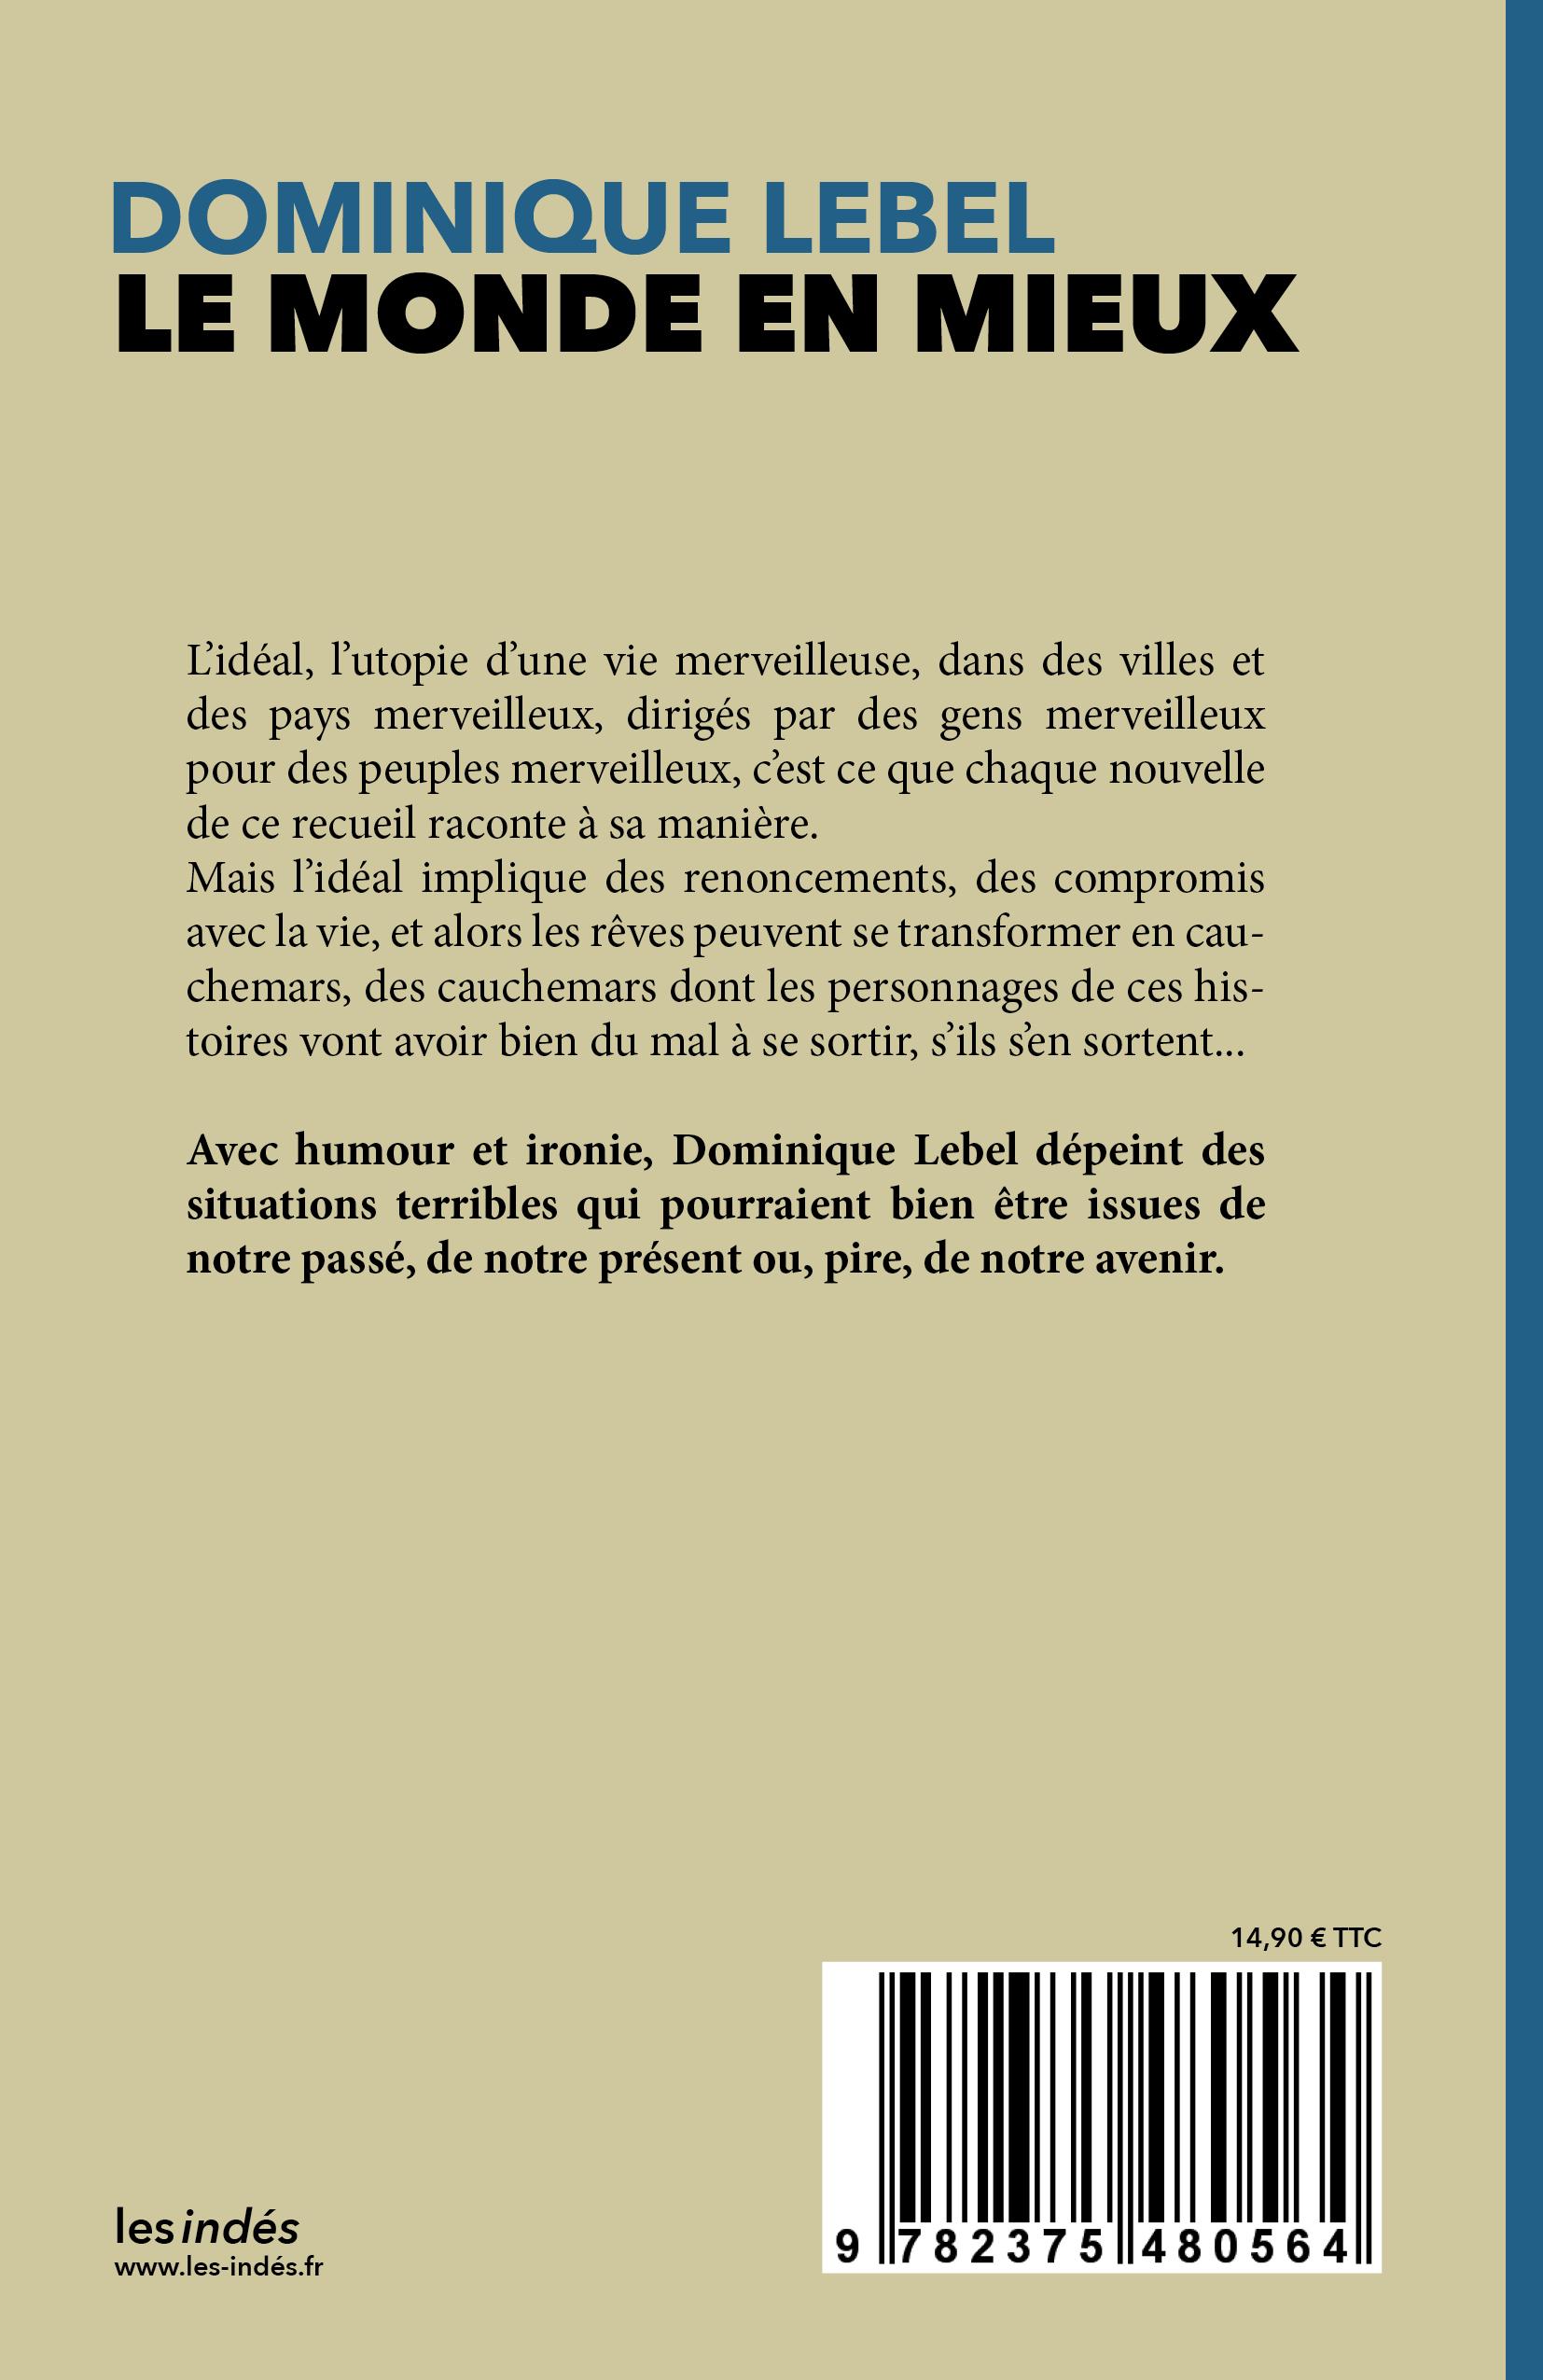 CV4_Le_Monde_en_mieux